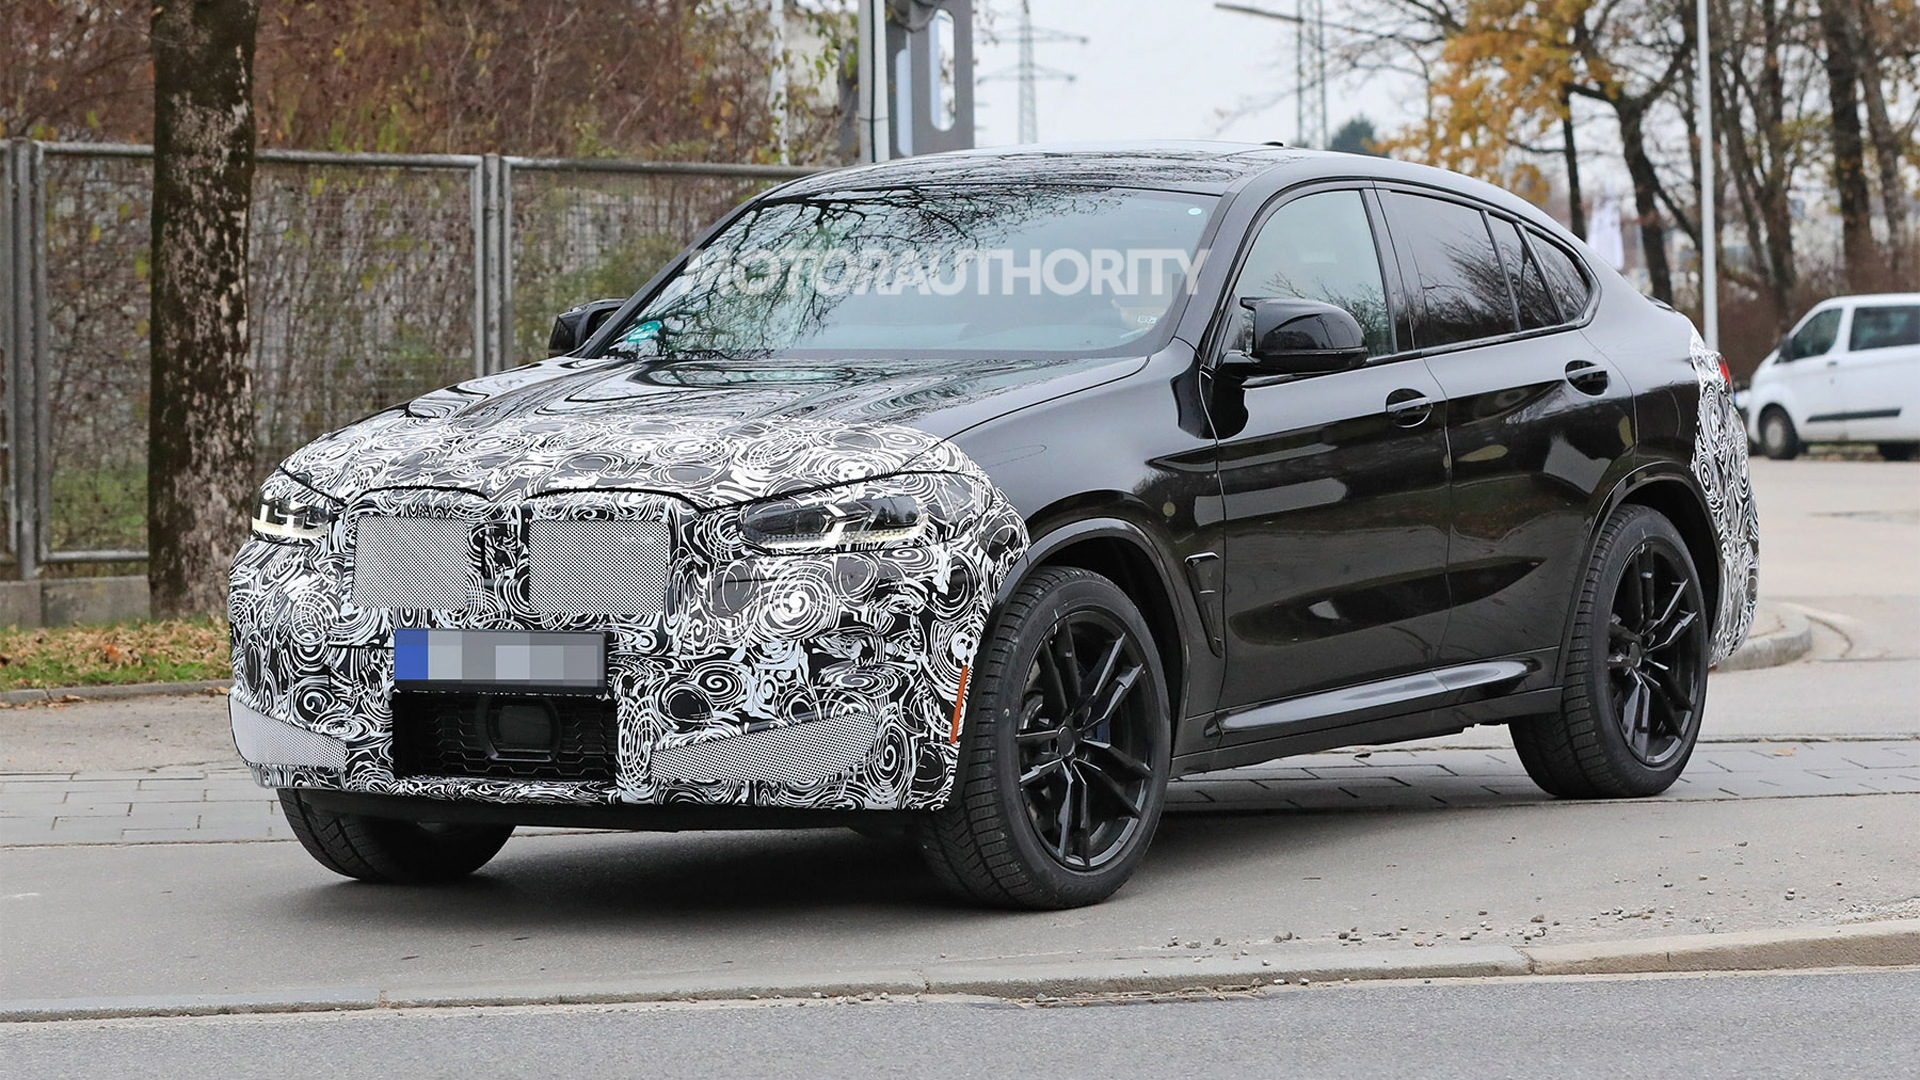 2022 BMW X4 M facelift spy shots - Photo credit: S. Baldauf/SB-Medien